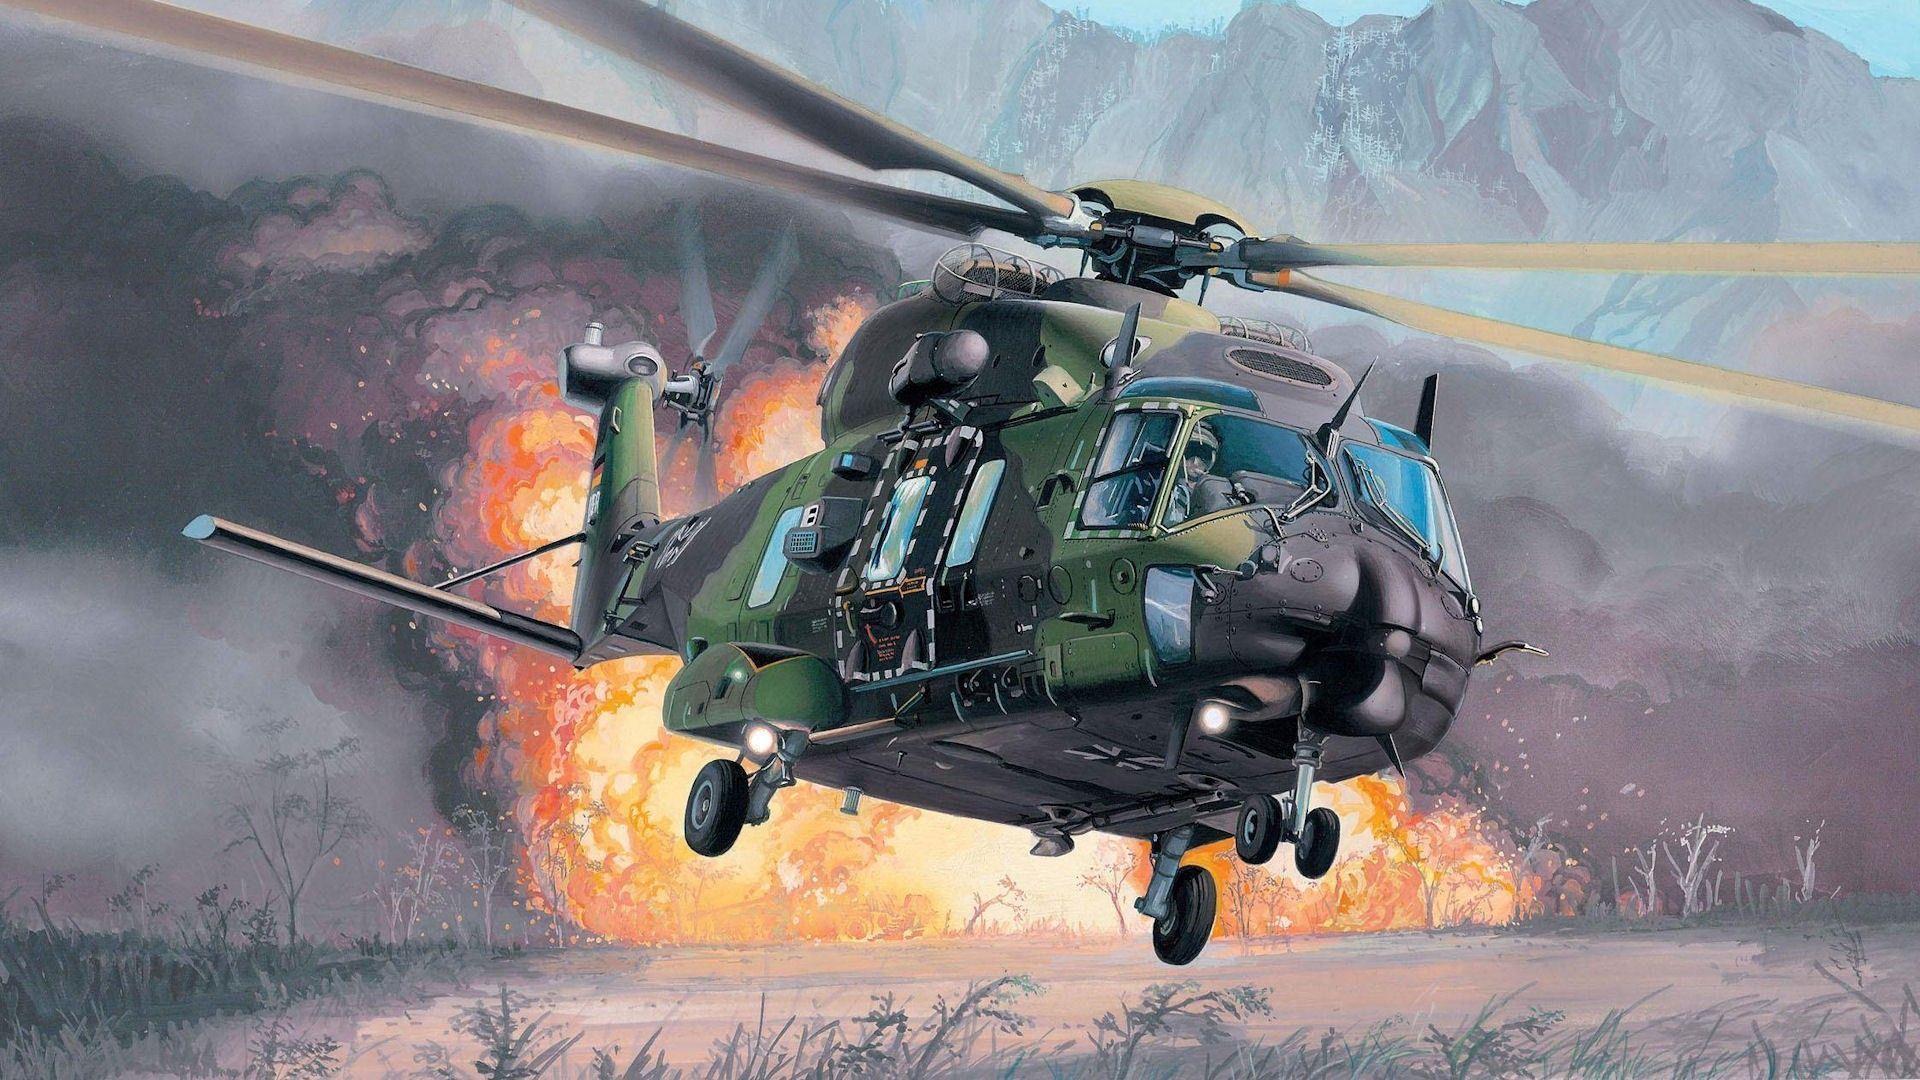 helicopter wallpaper hd desktop - photo #38